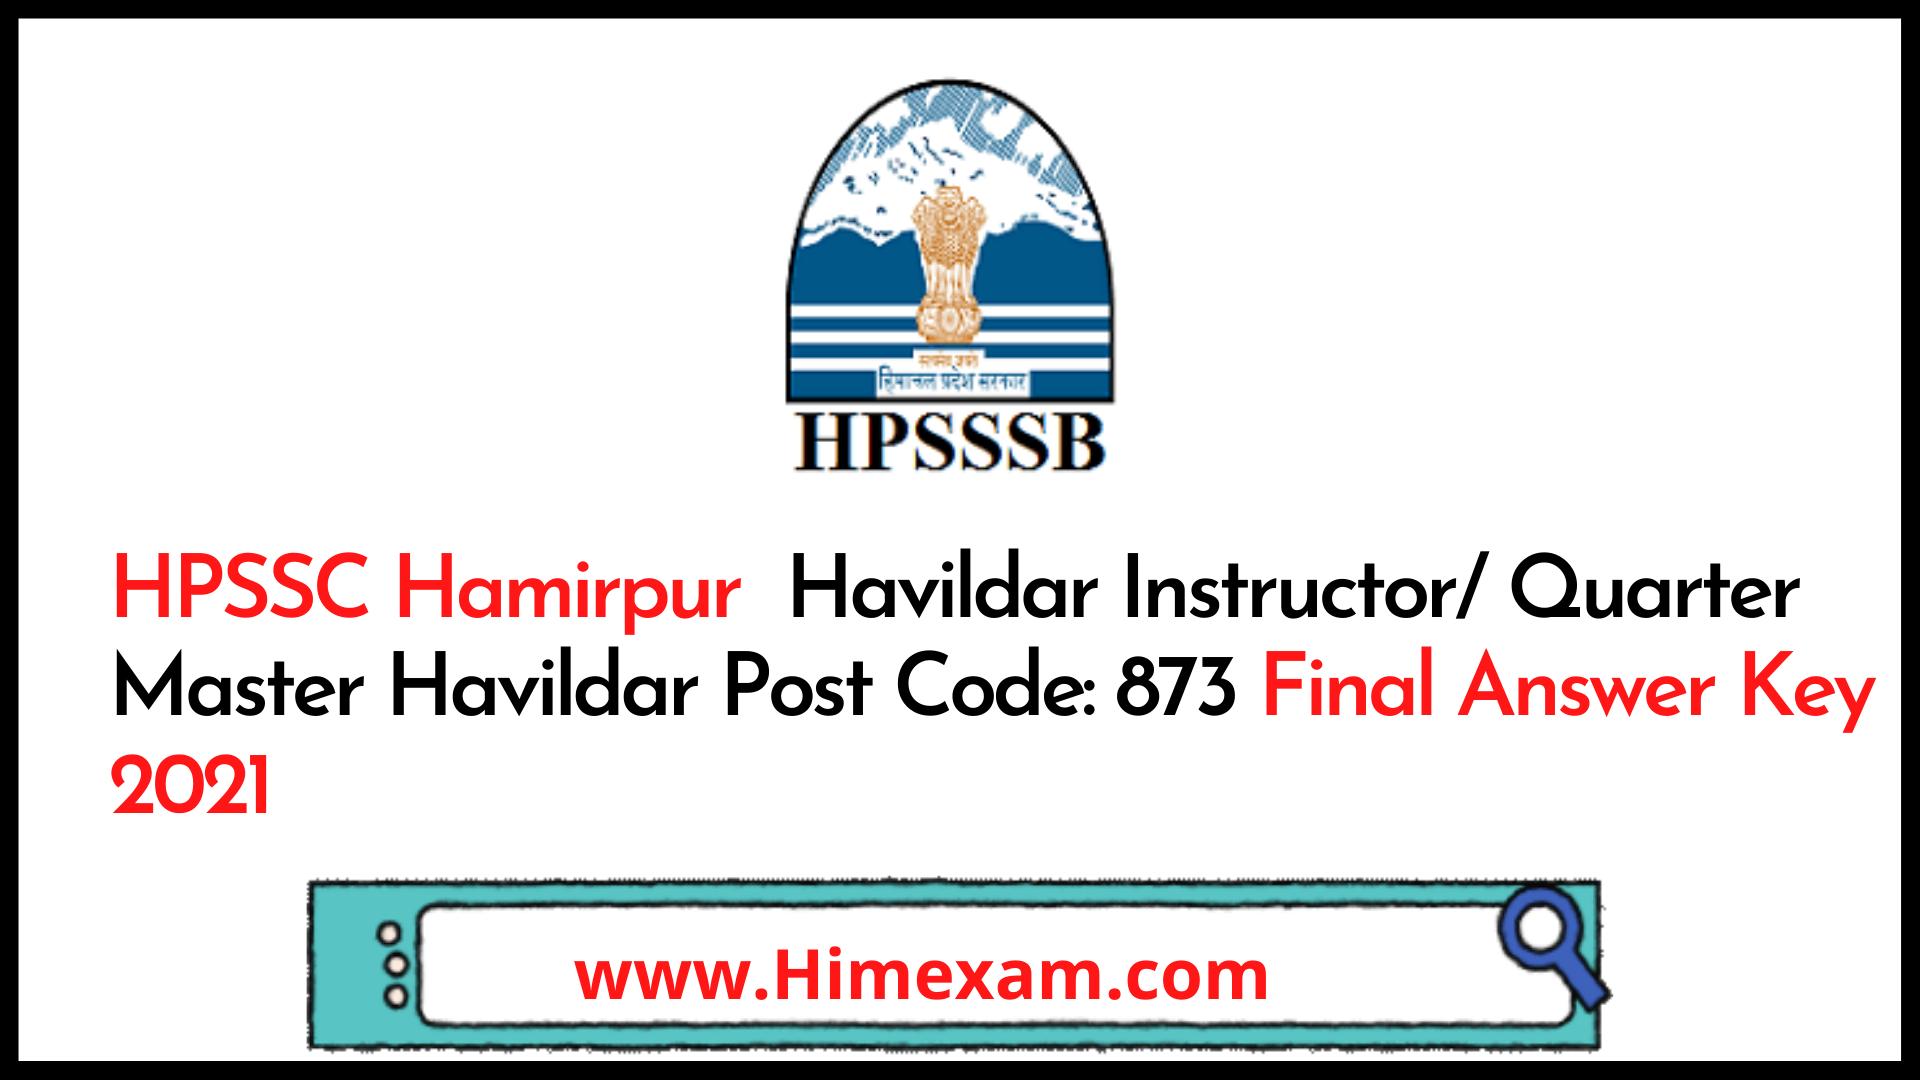 HPSSC Hamirpur  Havildar Instructor/ Quarter Master Havildar Post Code: 873 Final Answer Key 2021